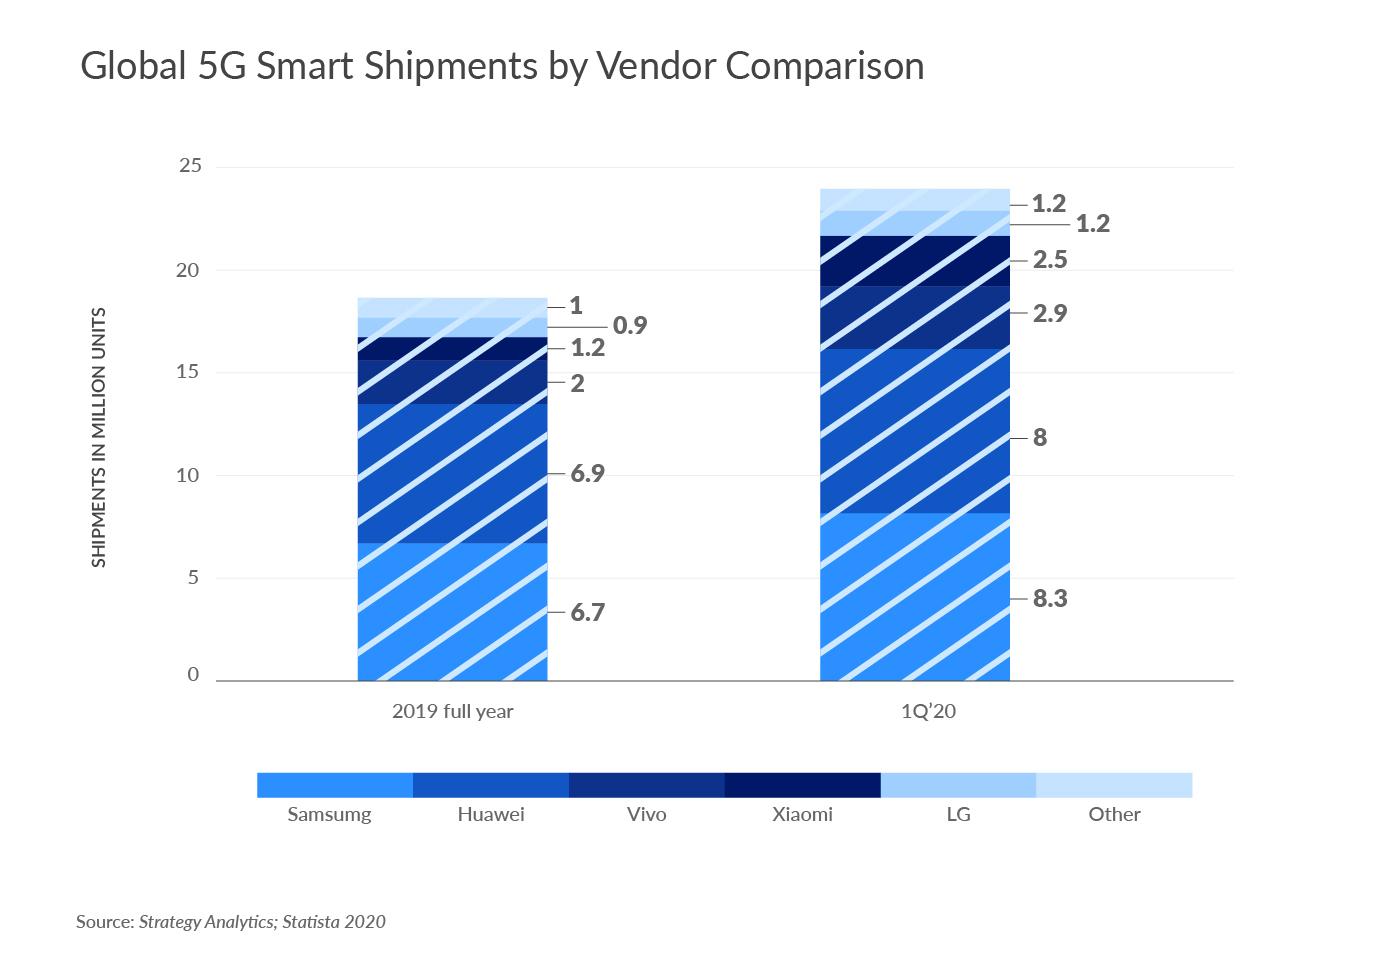 Global 5G Smart Shipments by Vendor Comparison